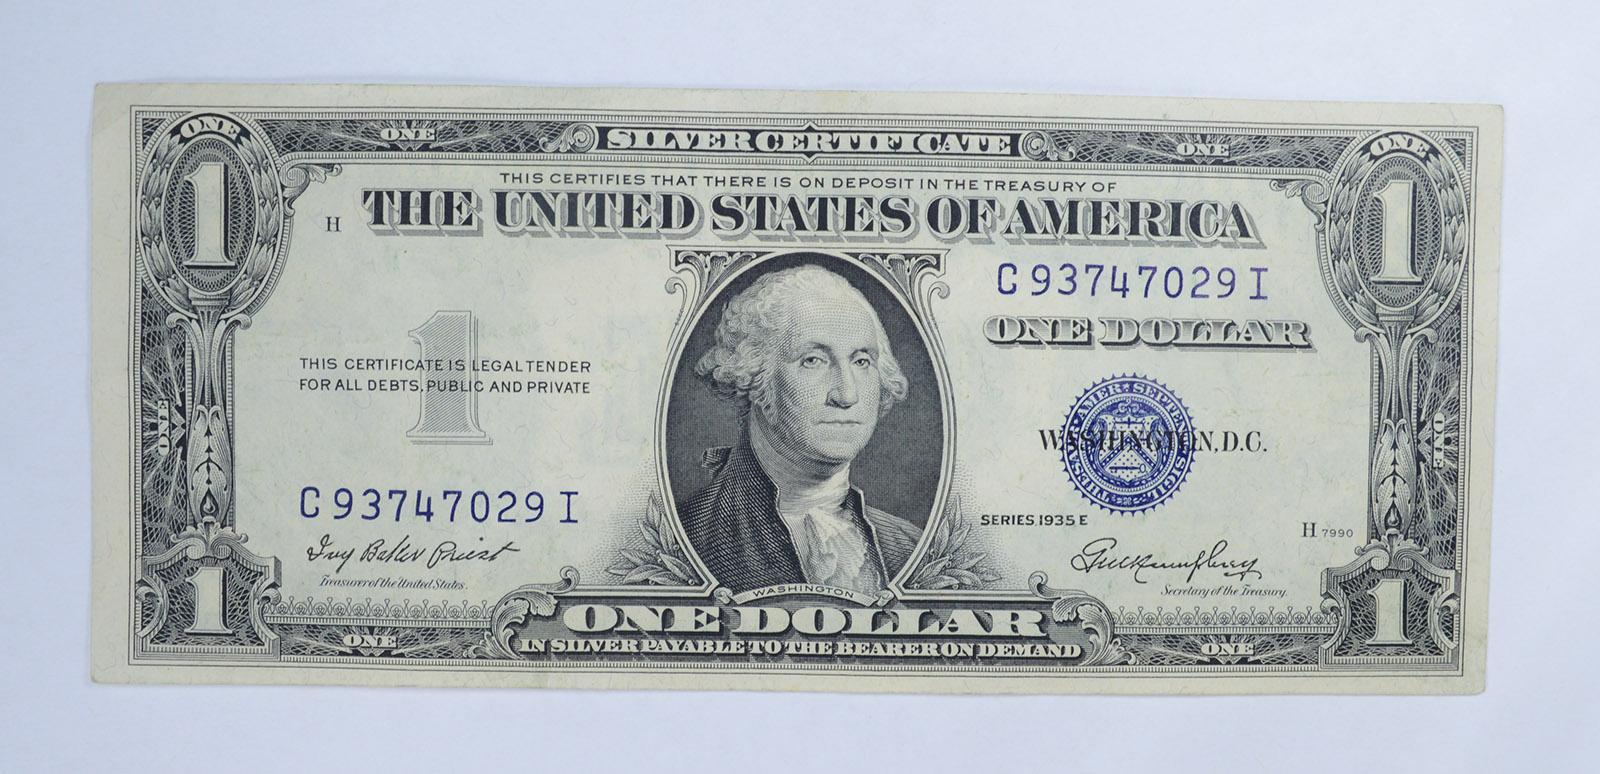 Crisp Difficult Preist Treasurer 1935 E Silver Certificate Blue